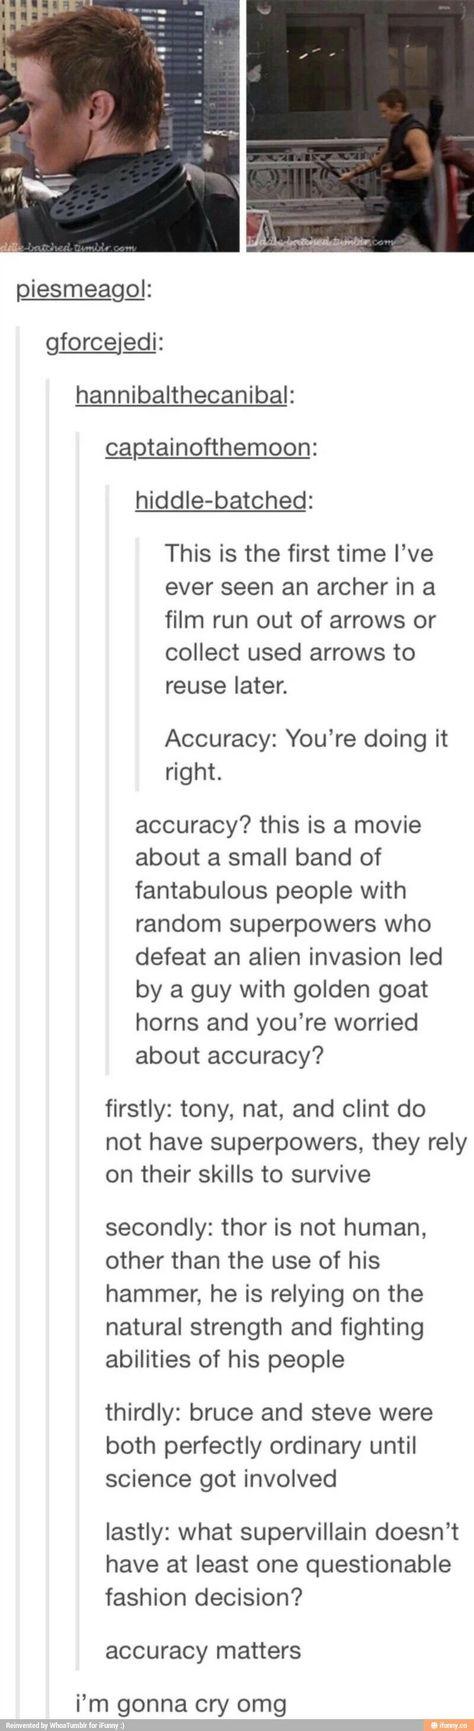 Accuracy of Avengers